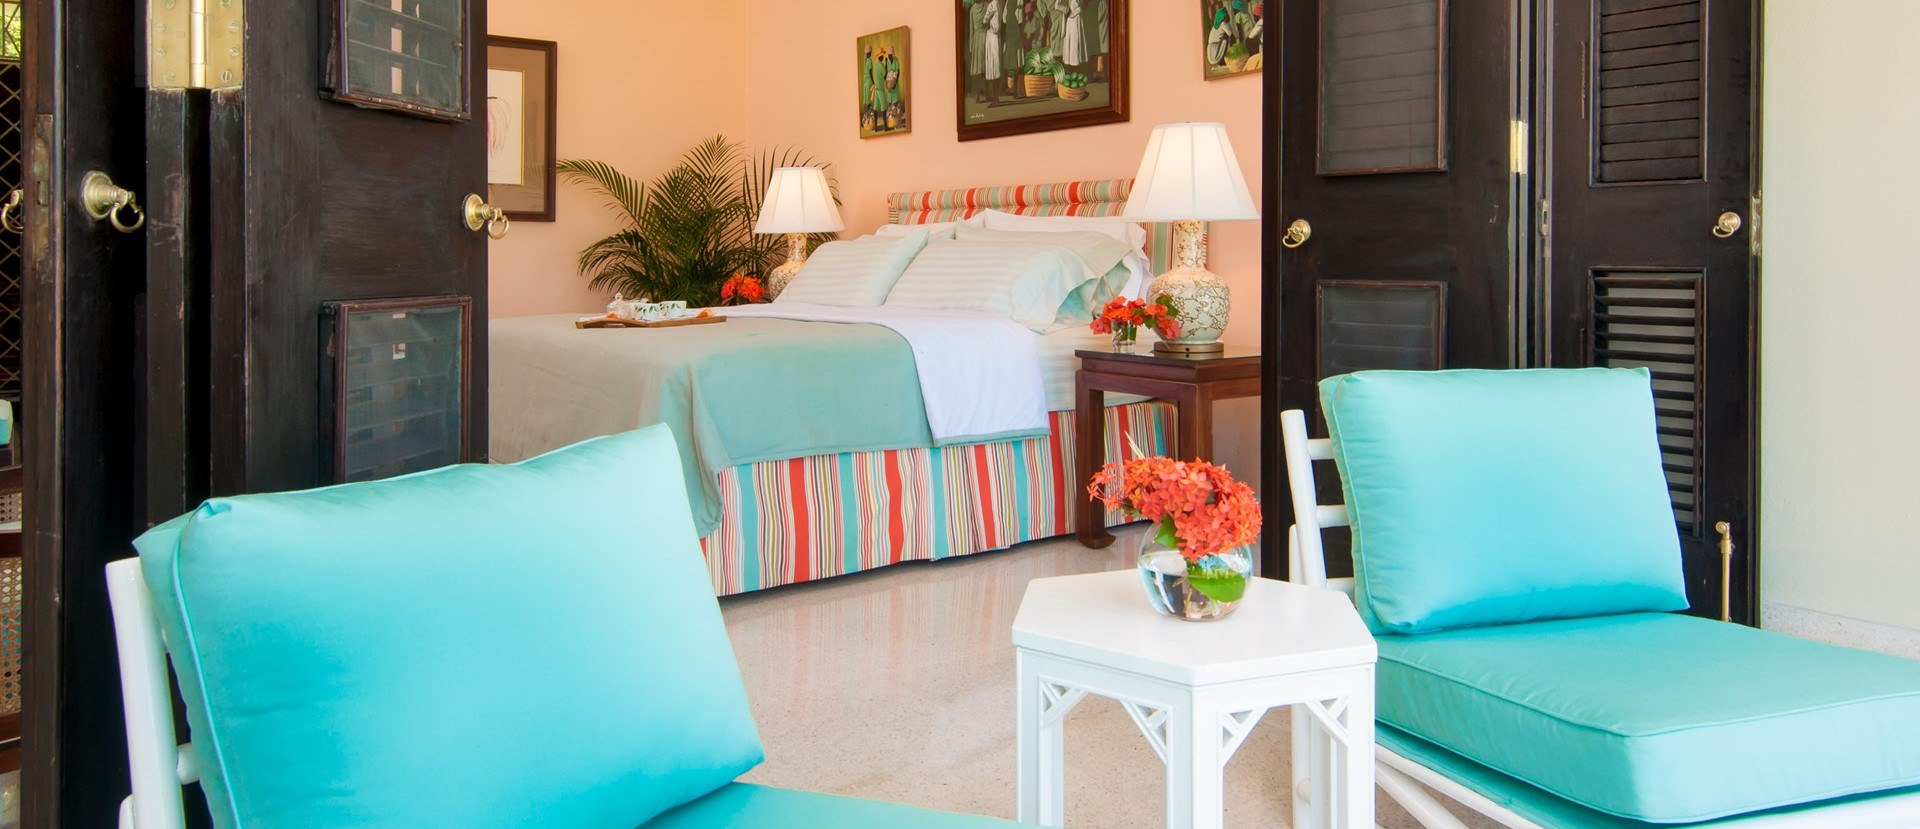 noble-house-villa-double-bedroom-2